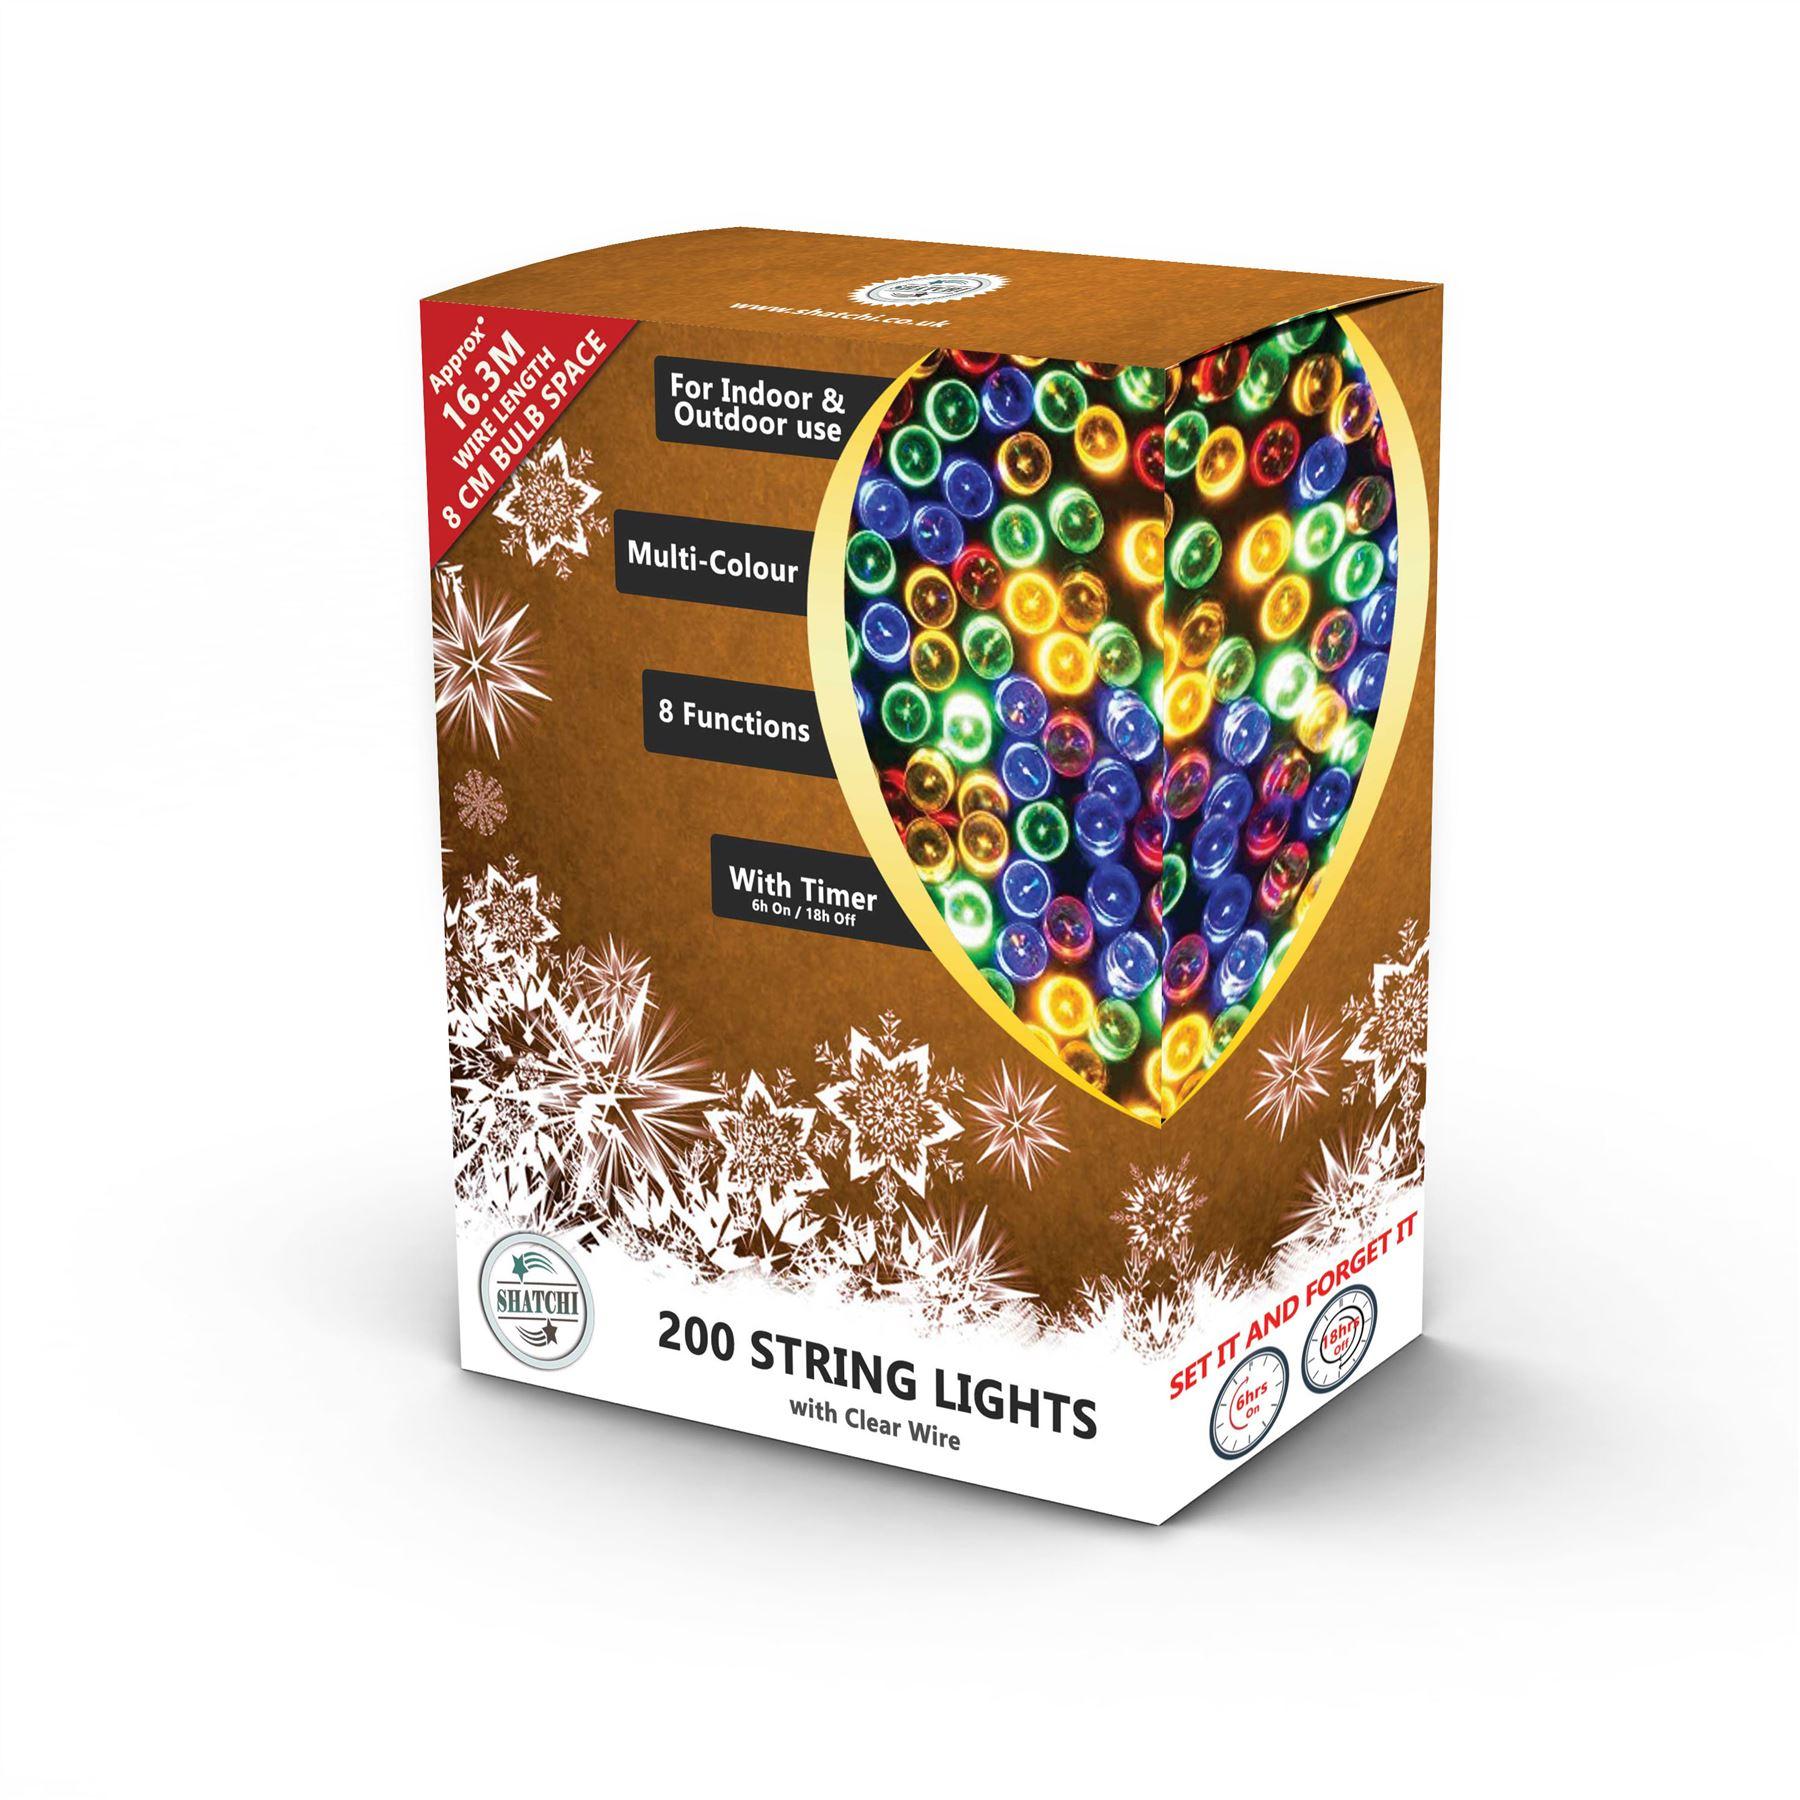 100-200-300-400-500-LED-Christmas-String-Fairy-Lights-Xmas-Decorations-Tree miniature 26